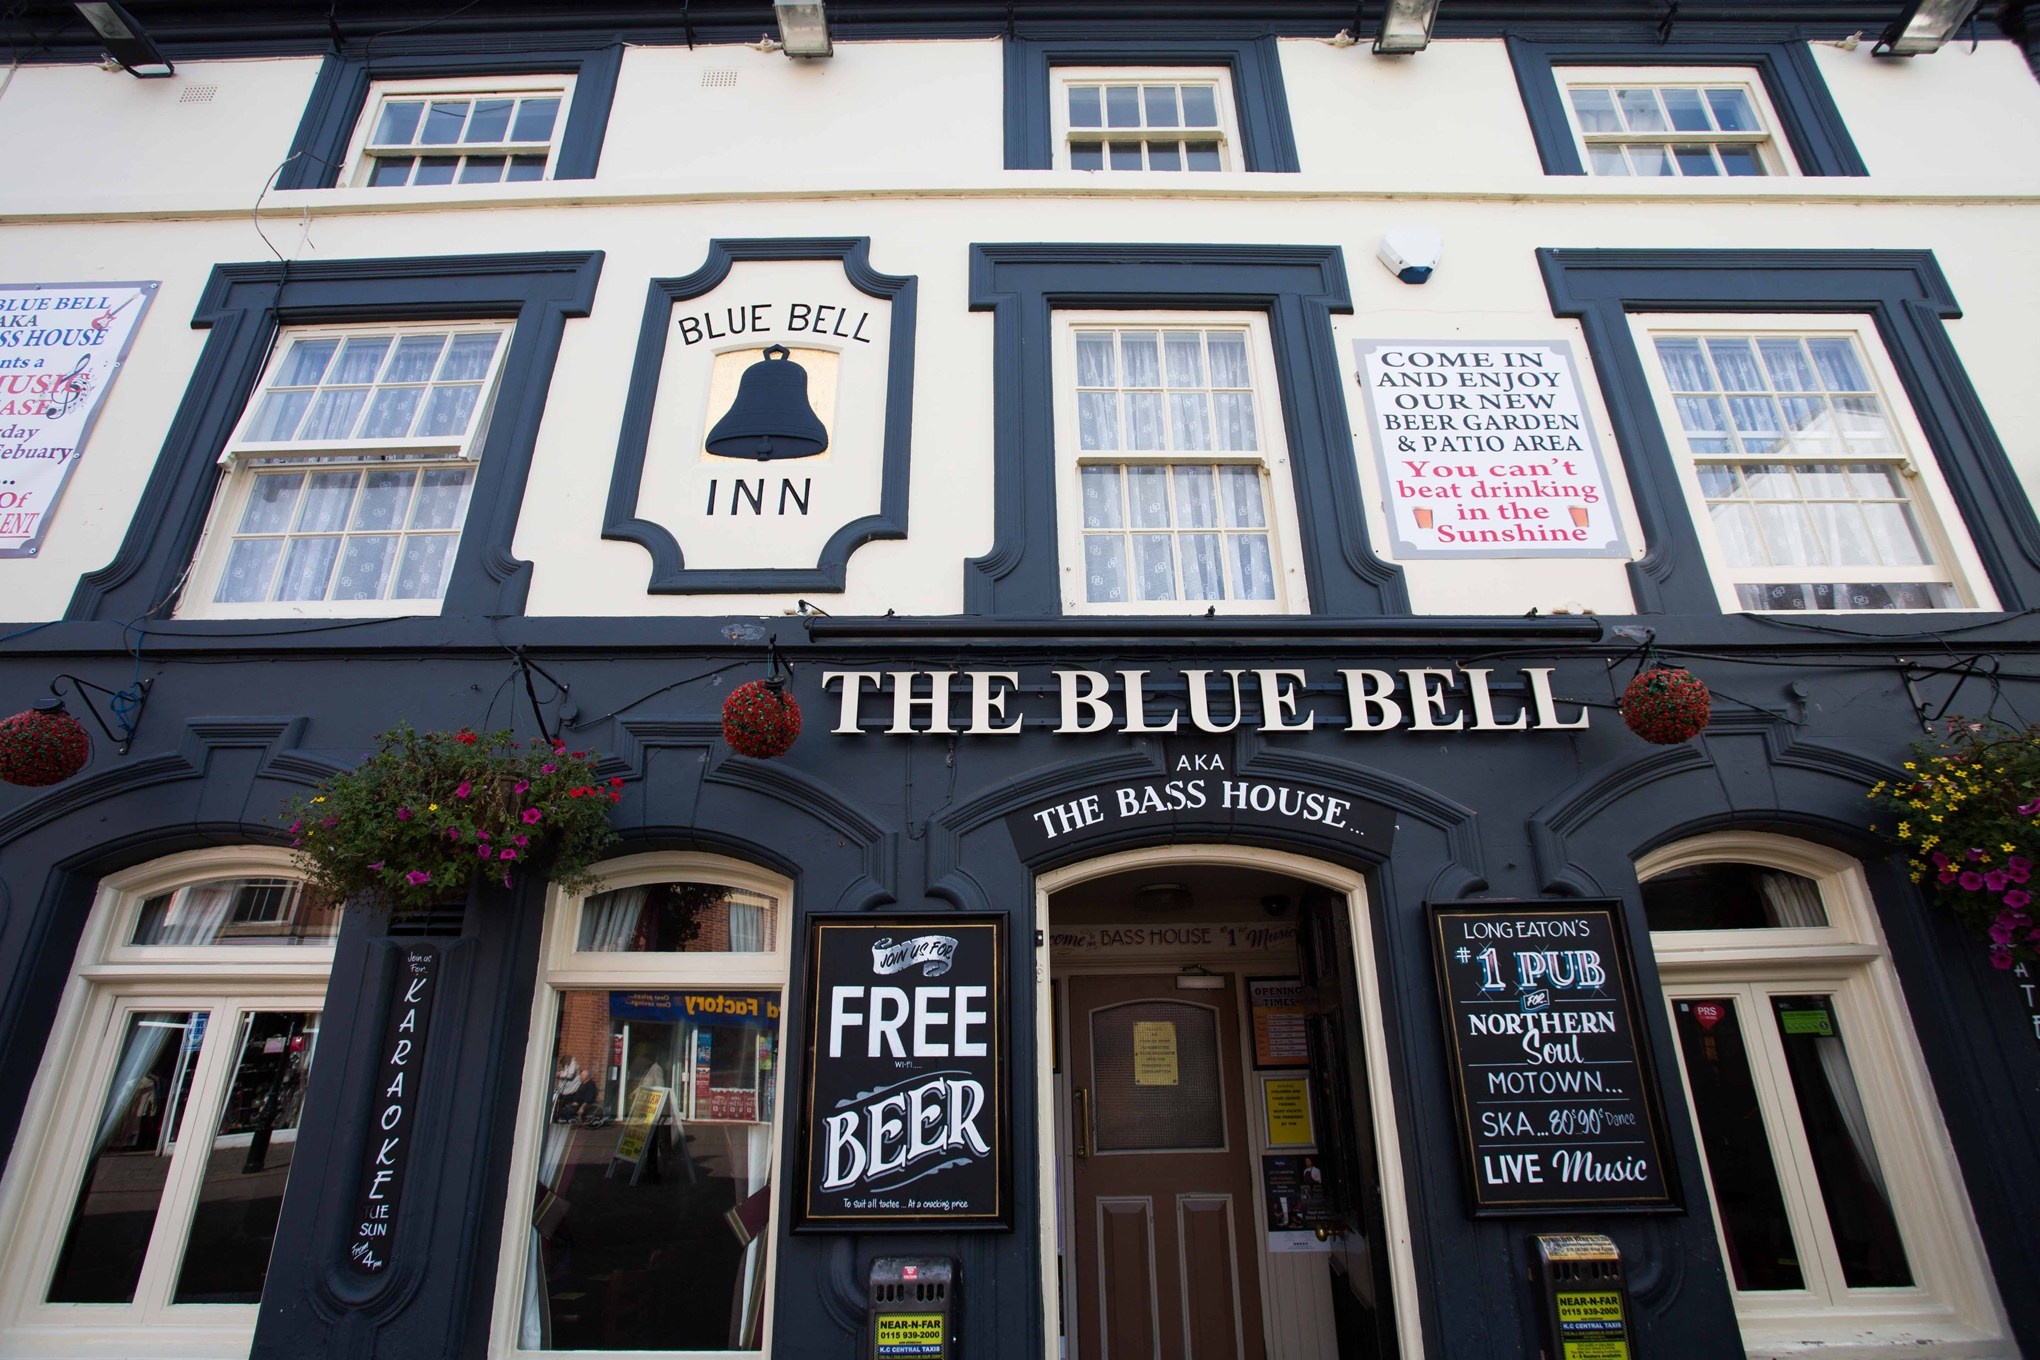 blue bell inn restaurant blue bell pa opentable - HD2040×1360